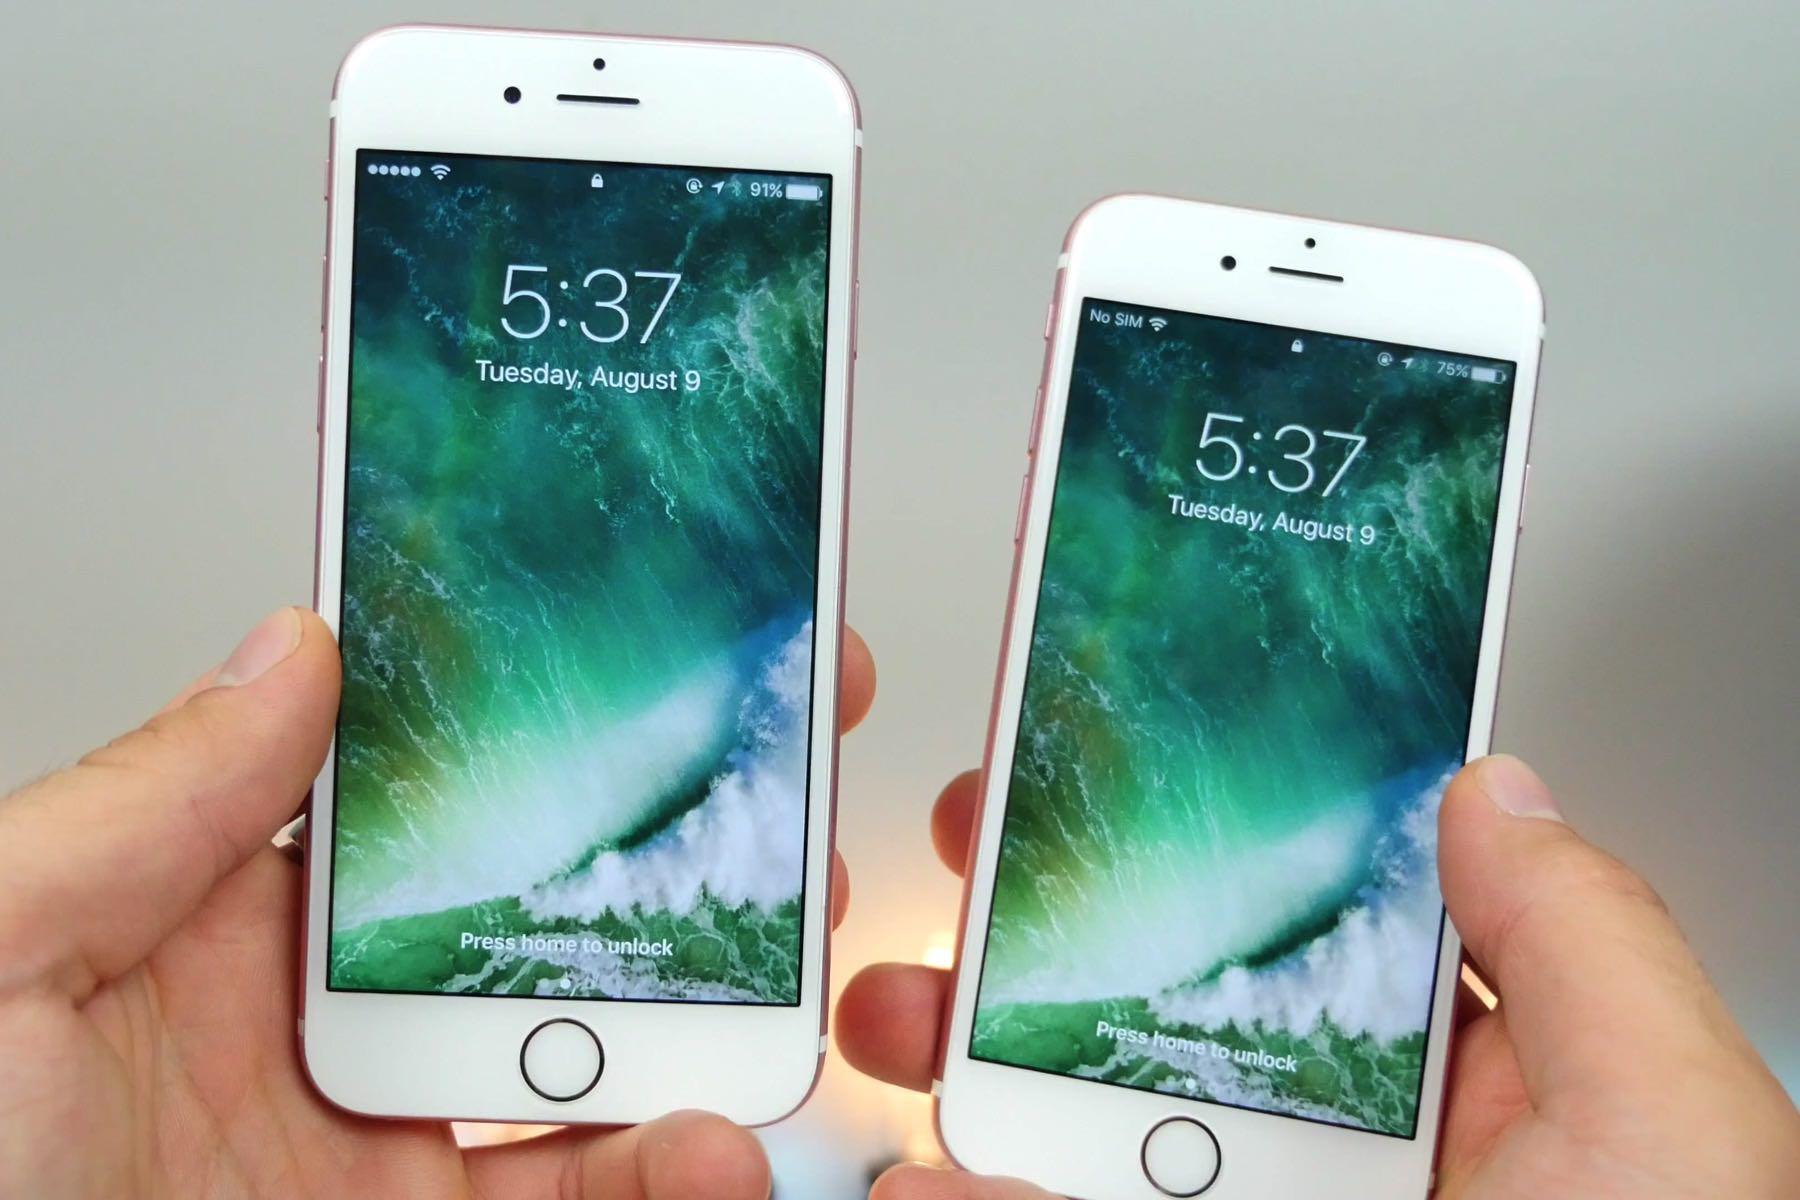 iOS-9.3.4-iOS-10-beta-7-download-2